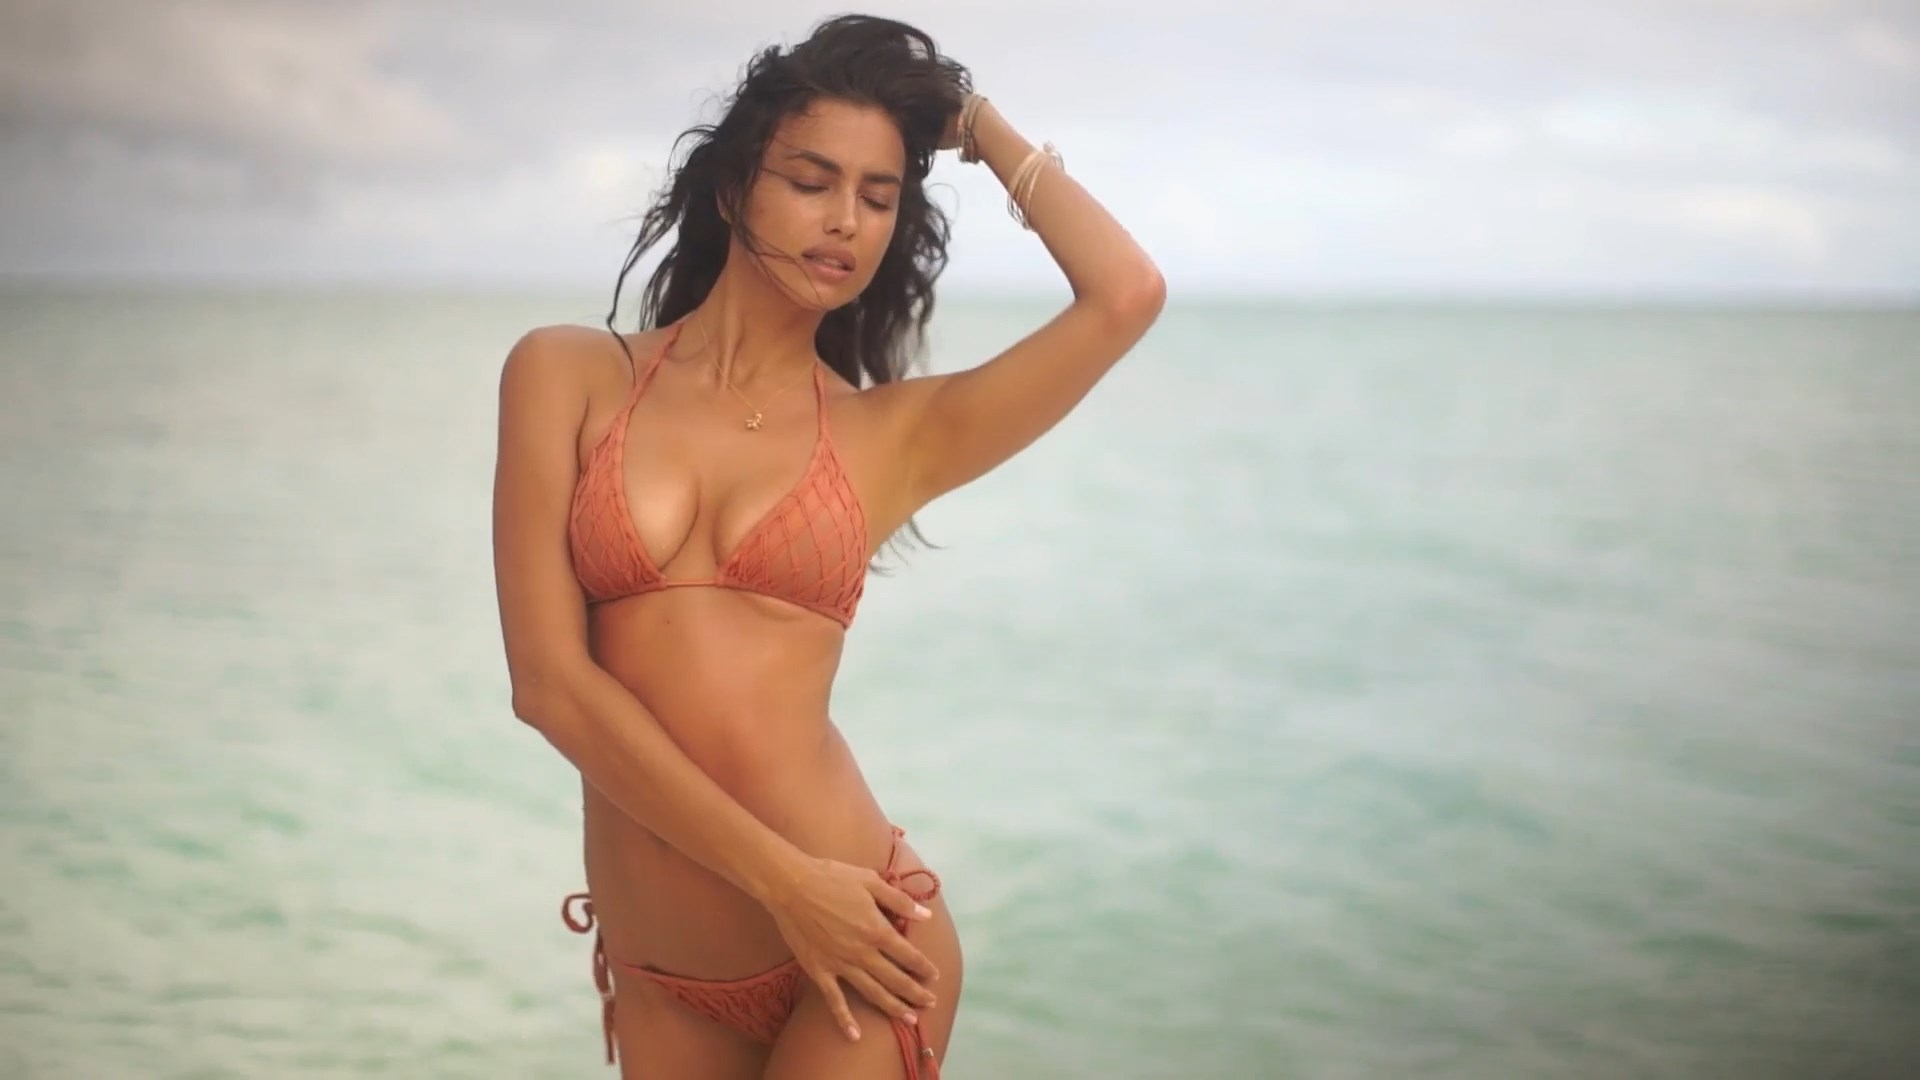 Irina Shayk booty